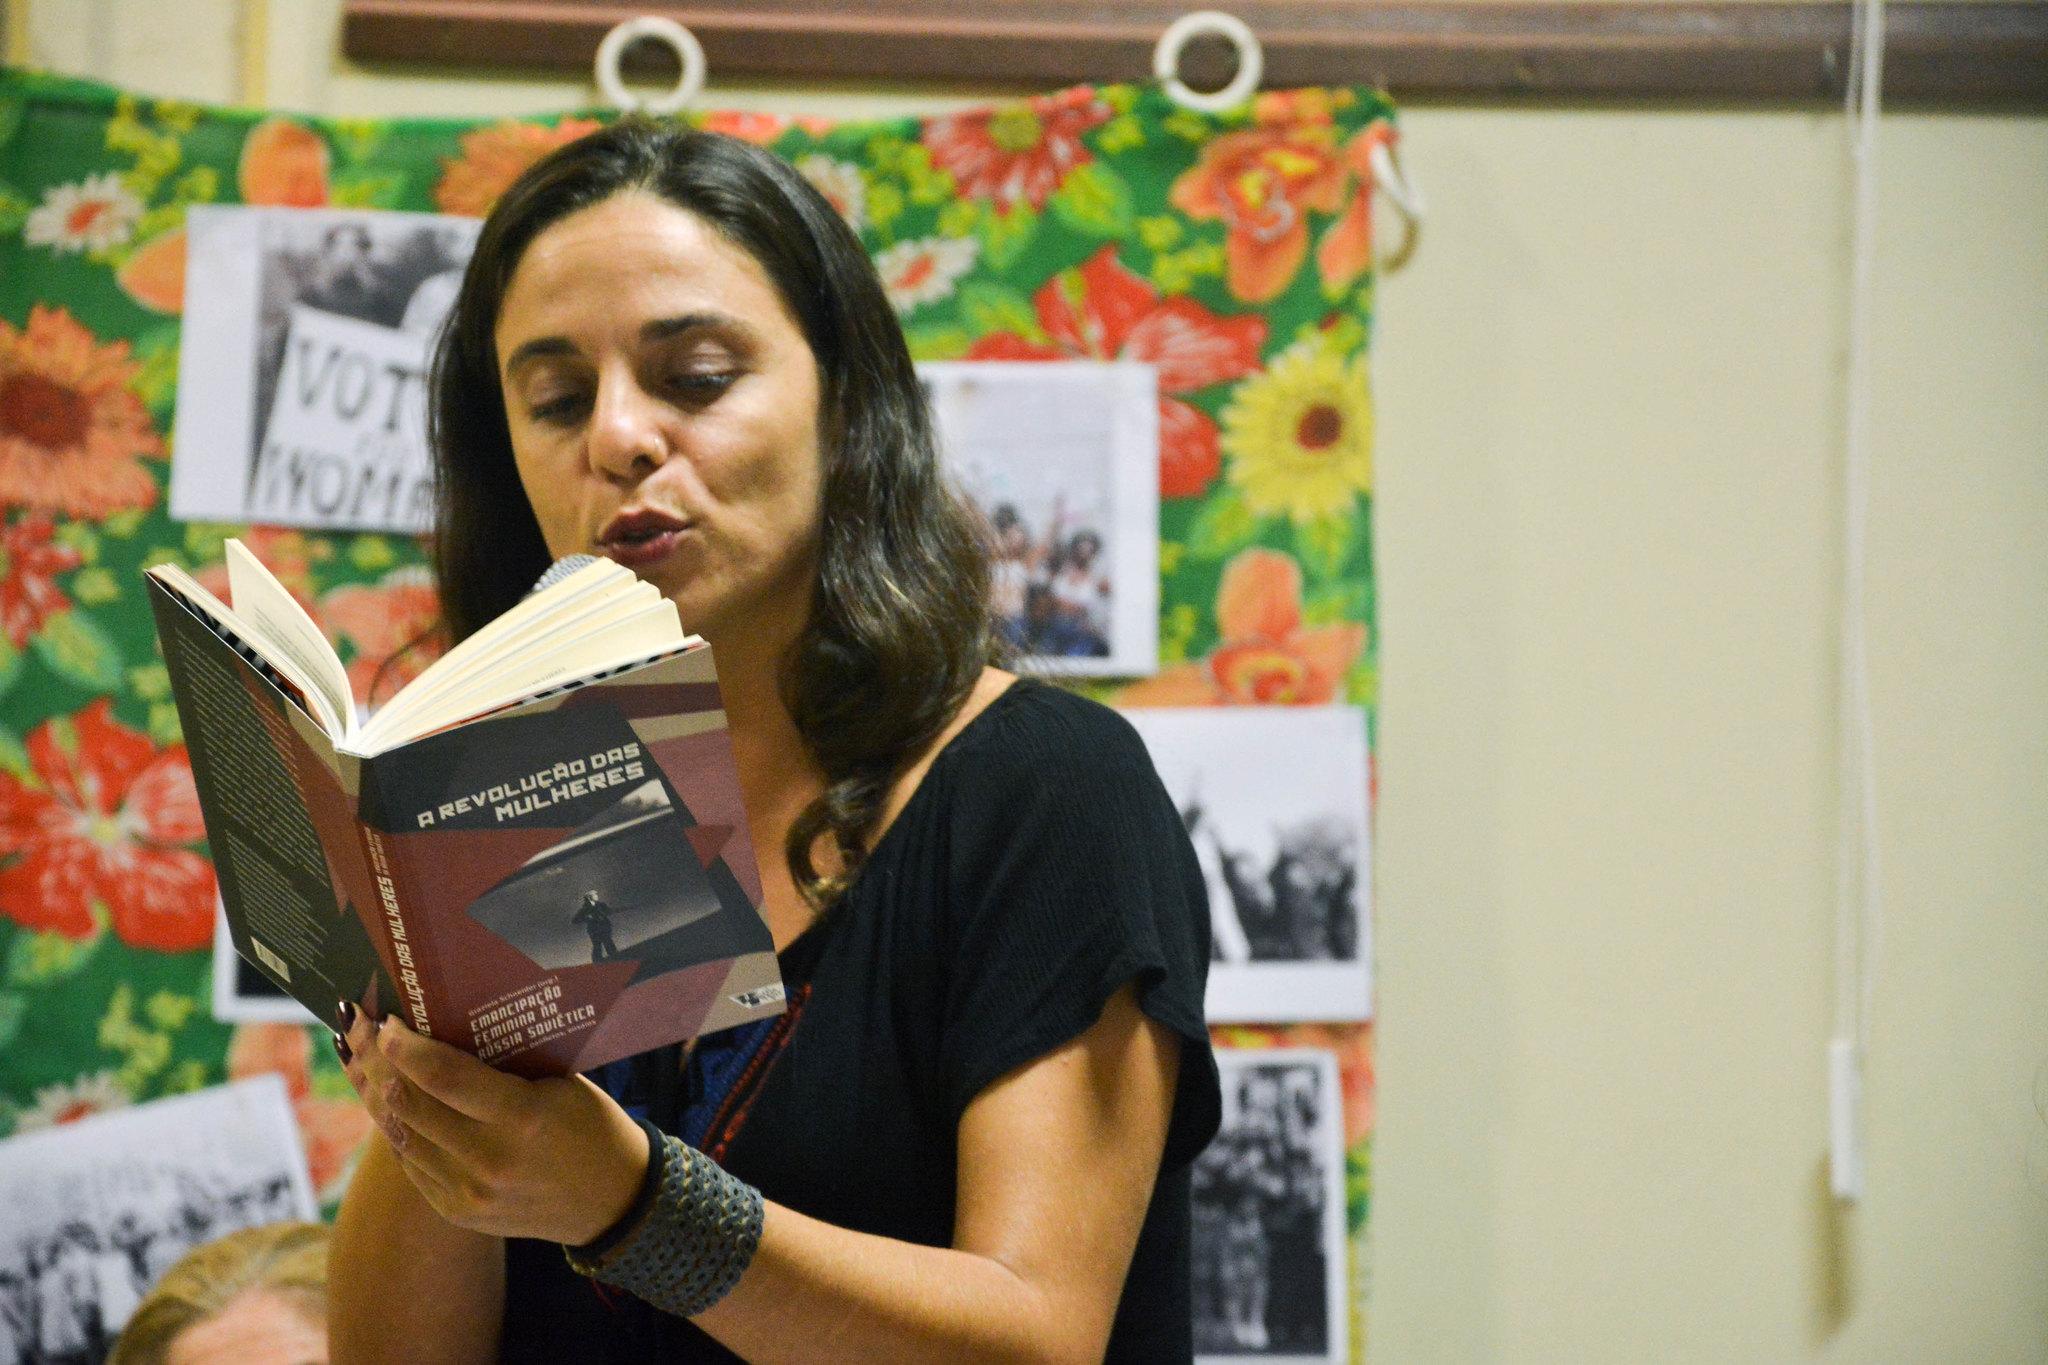 O Brasil que nós queremos respira leitura